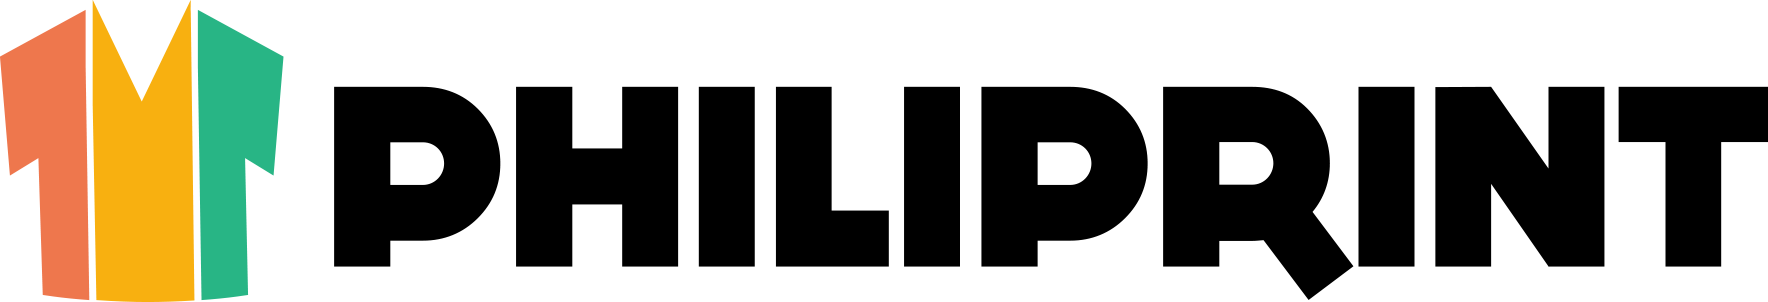 logo philiprint